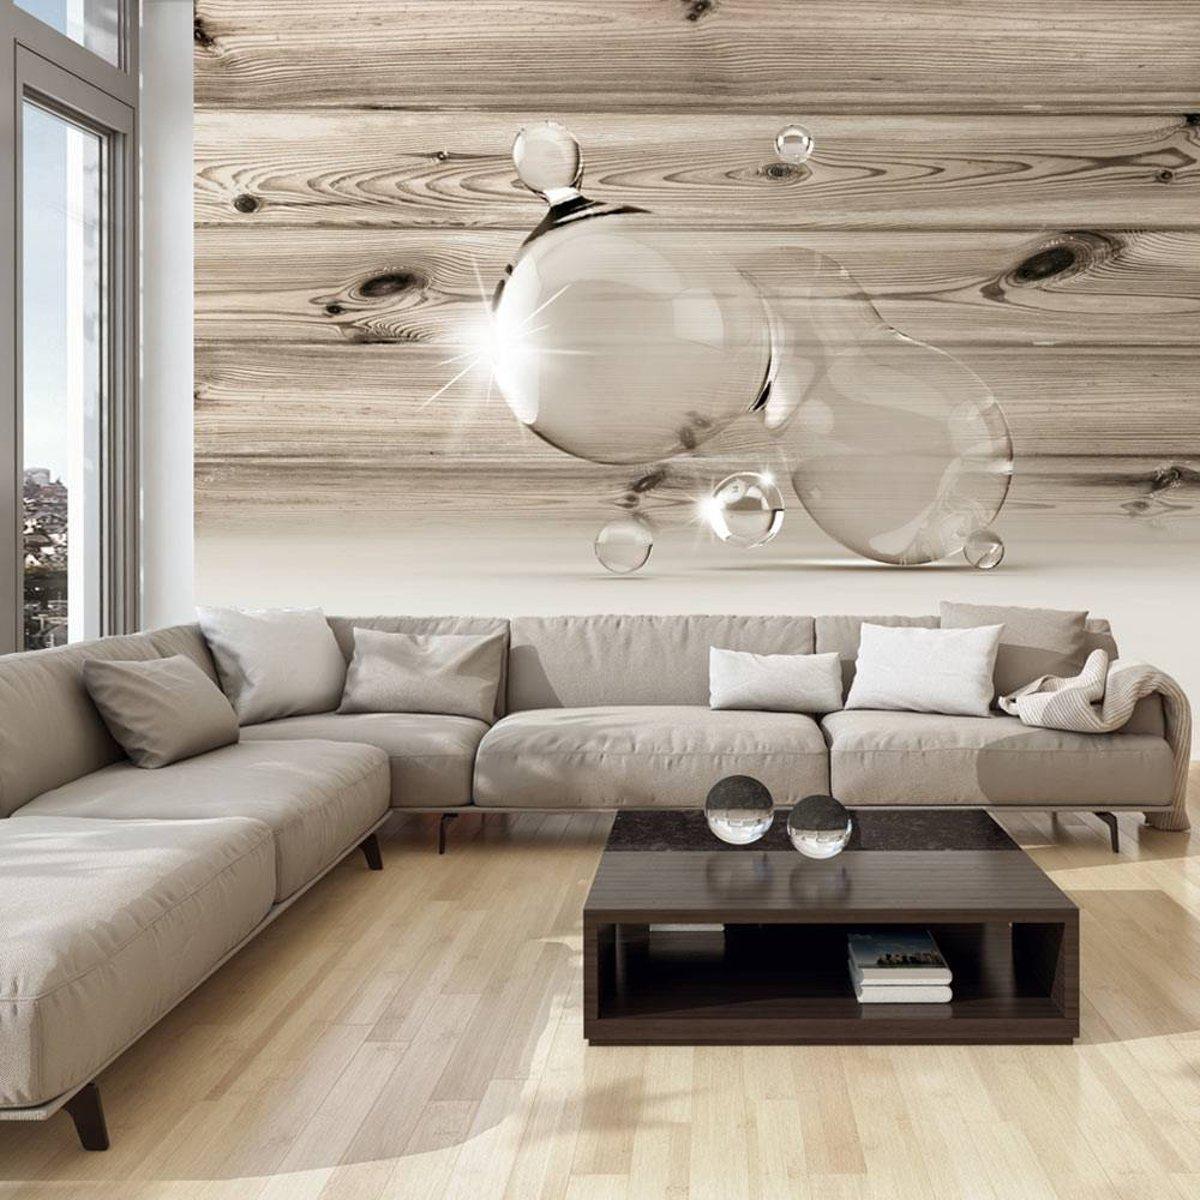 Fotobehang - Druppels op hout - 200x140